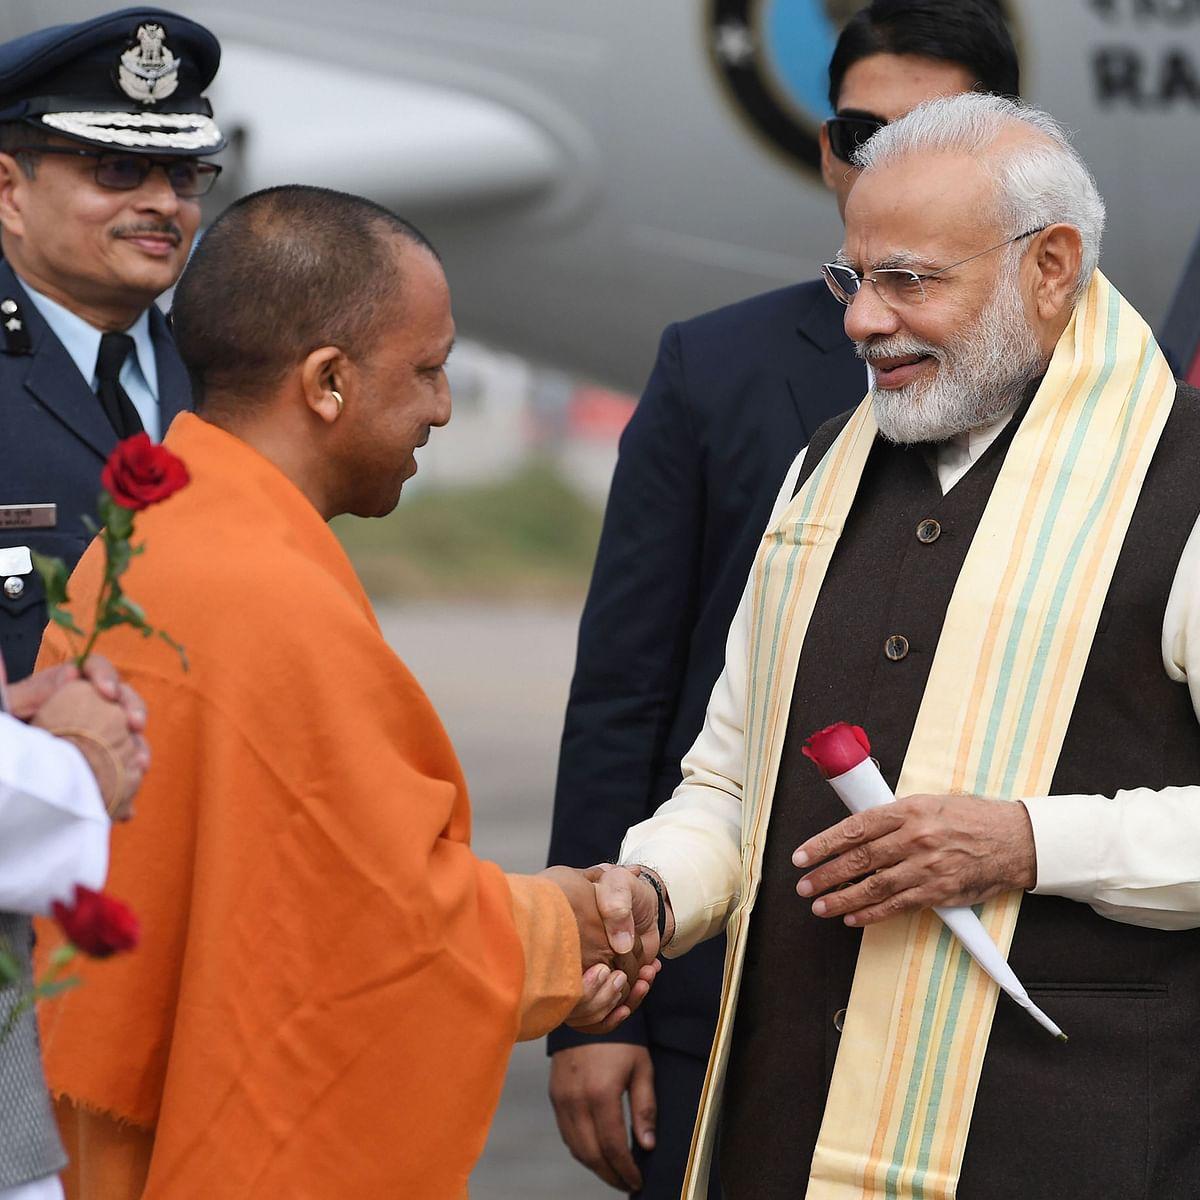 Hathras gang-rape: PM Modi speaks to Yogi Adityanath; SIT to probe incident